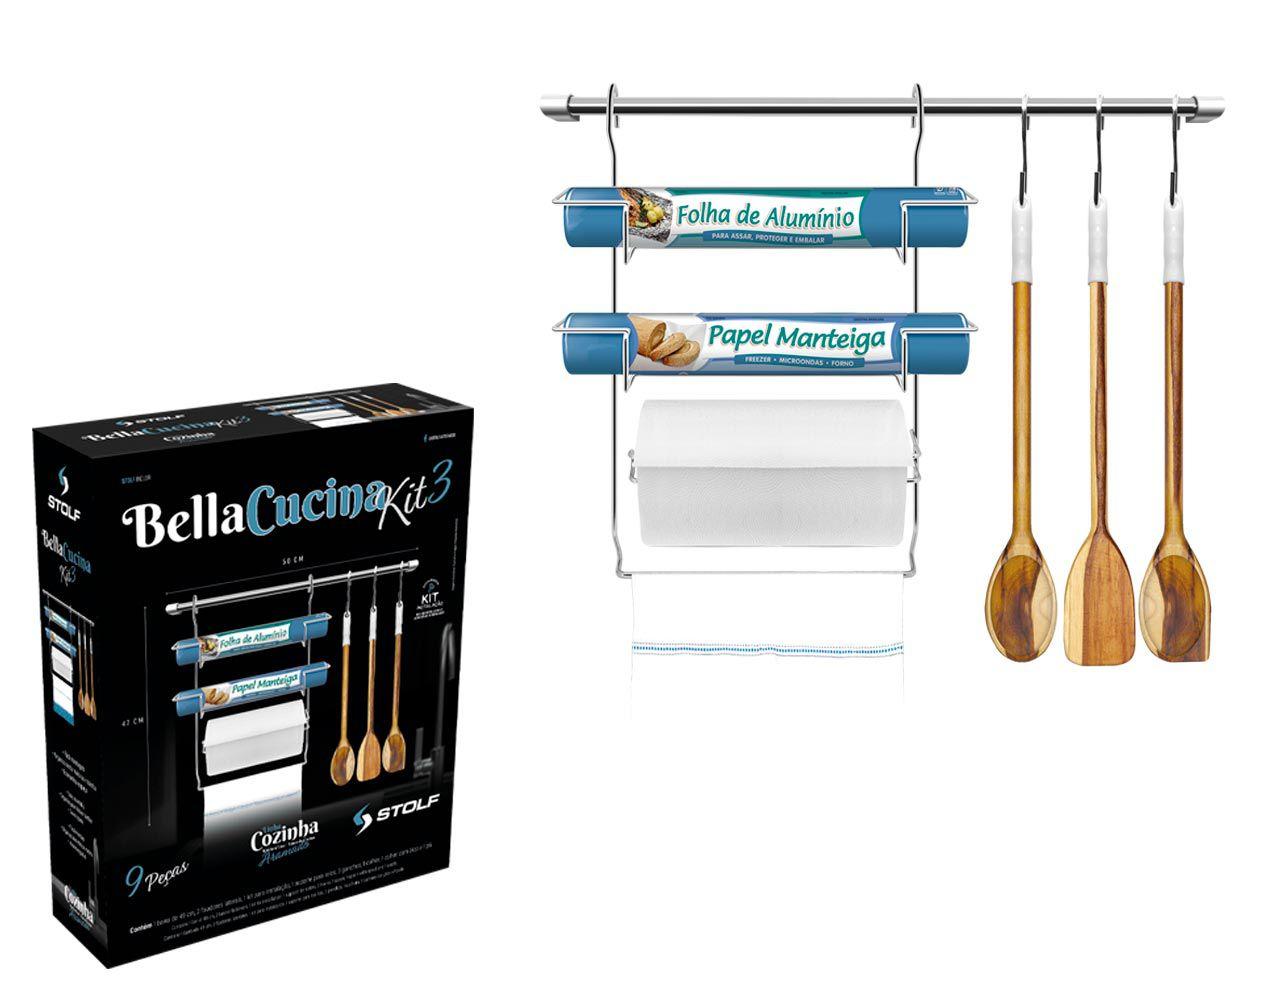 Bella Cucina Kit 3 Stolf